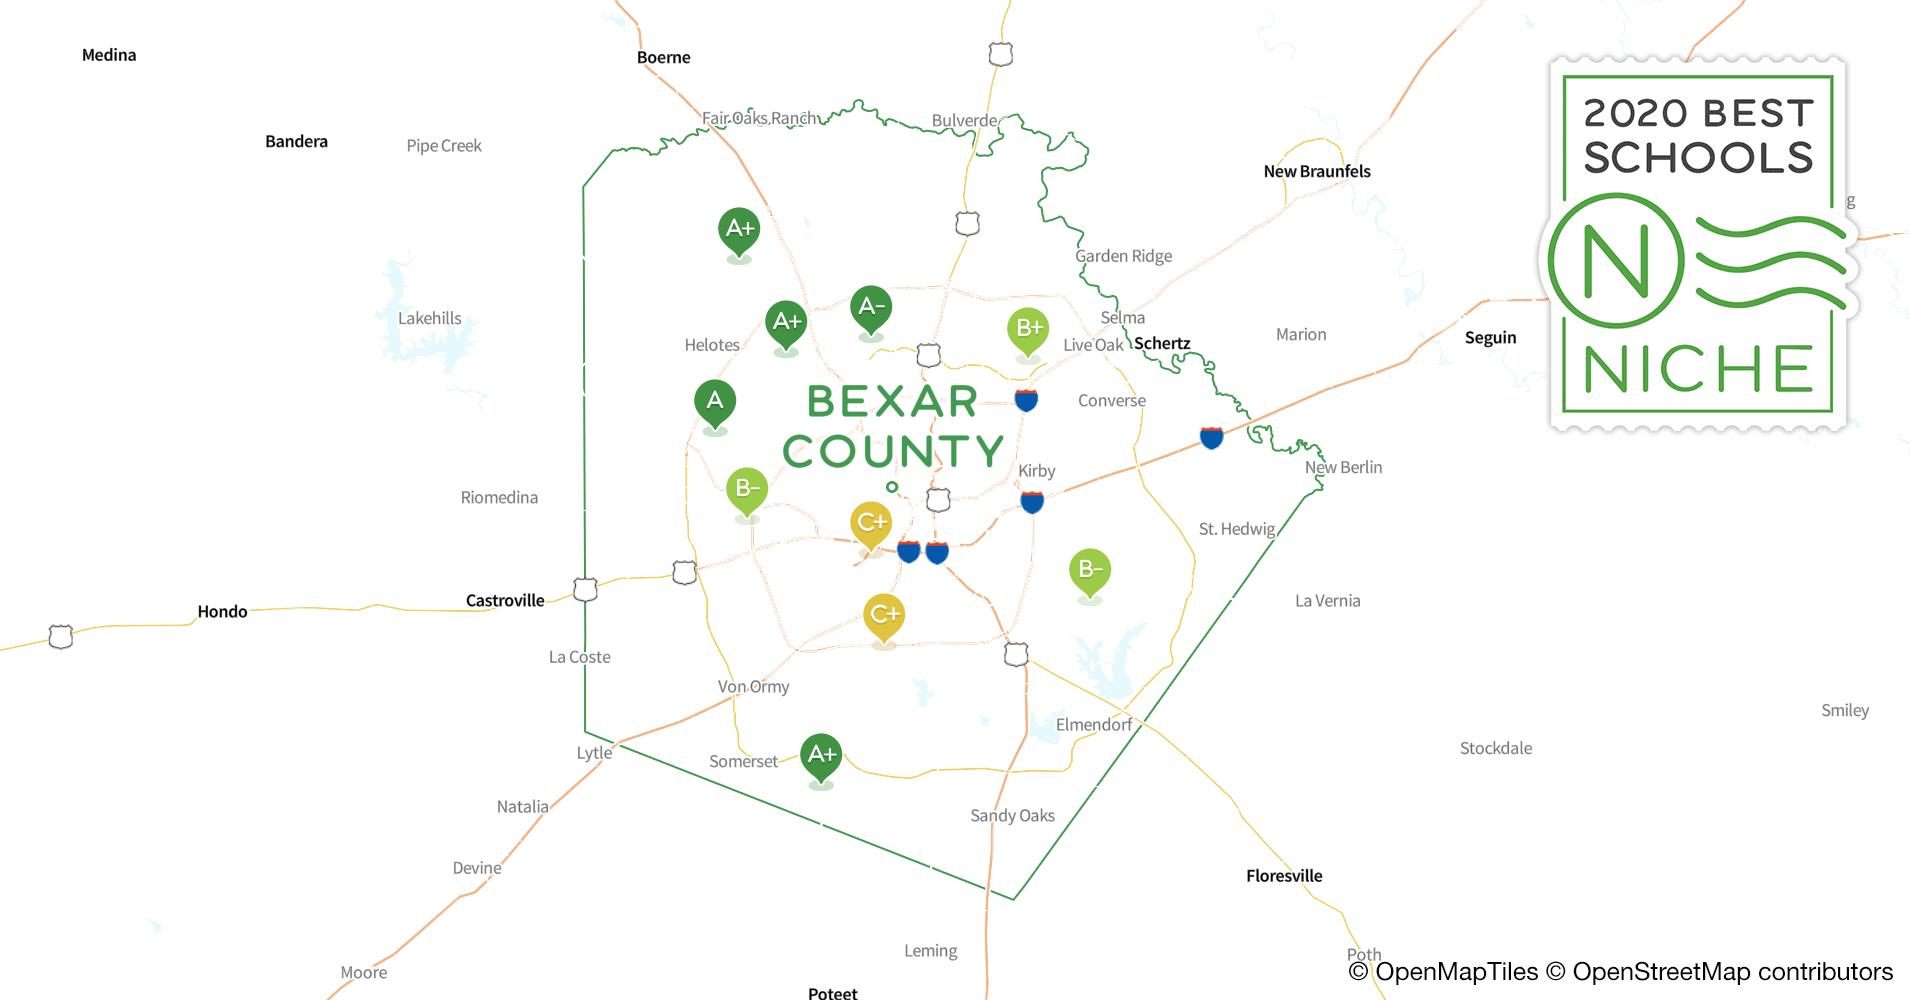 School Districts in Bexar County, TX - Niche